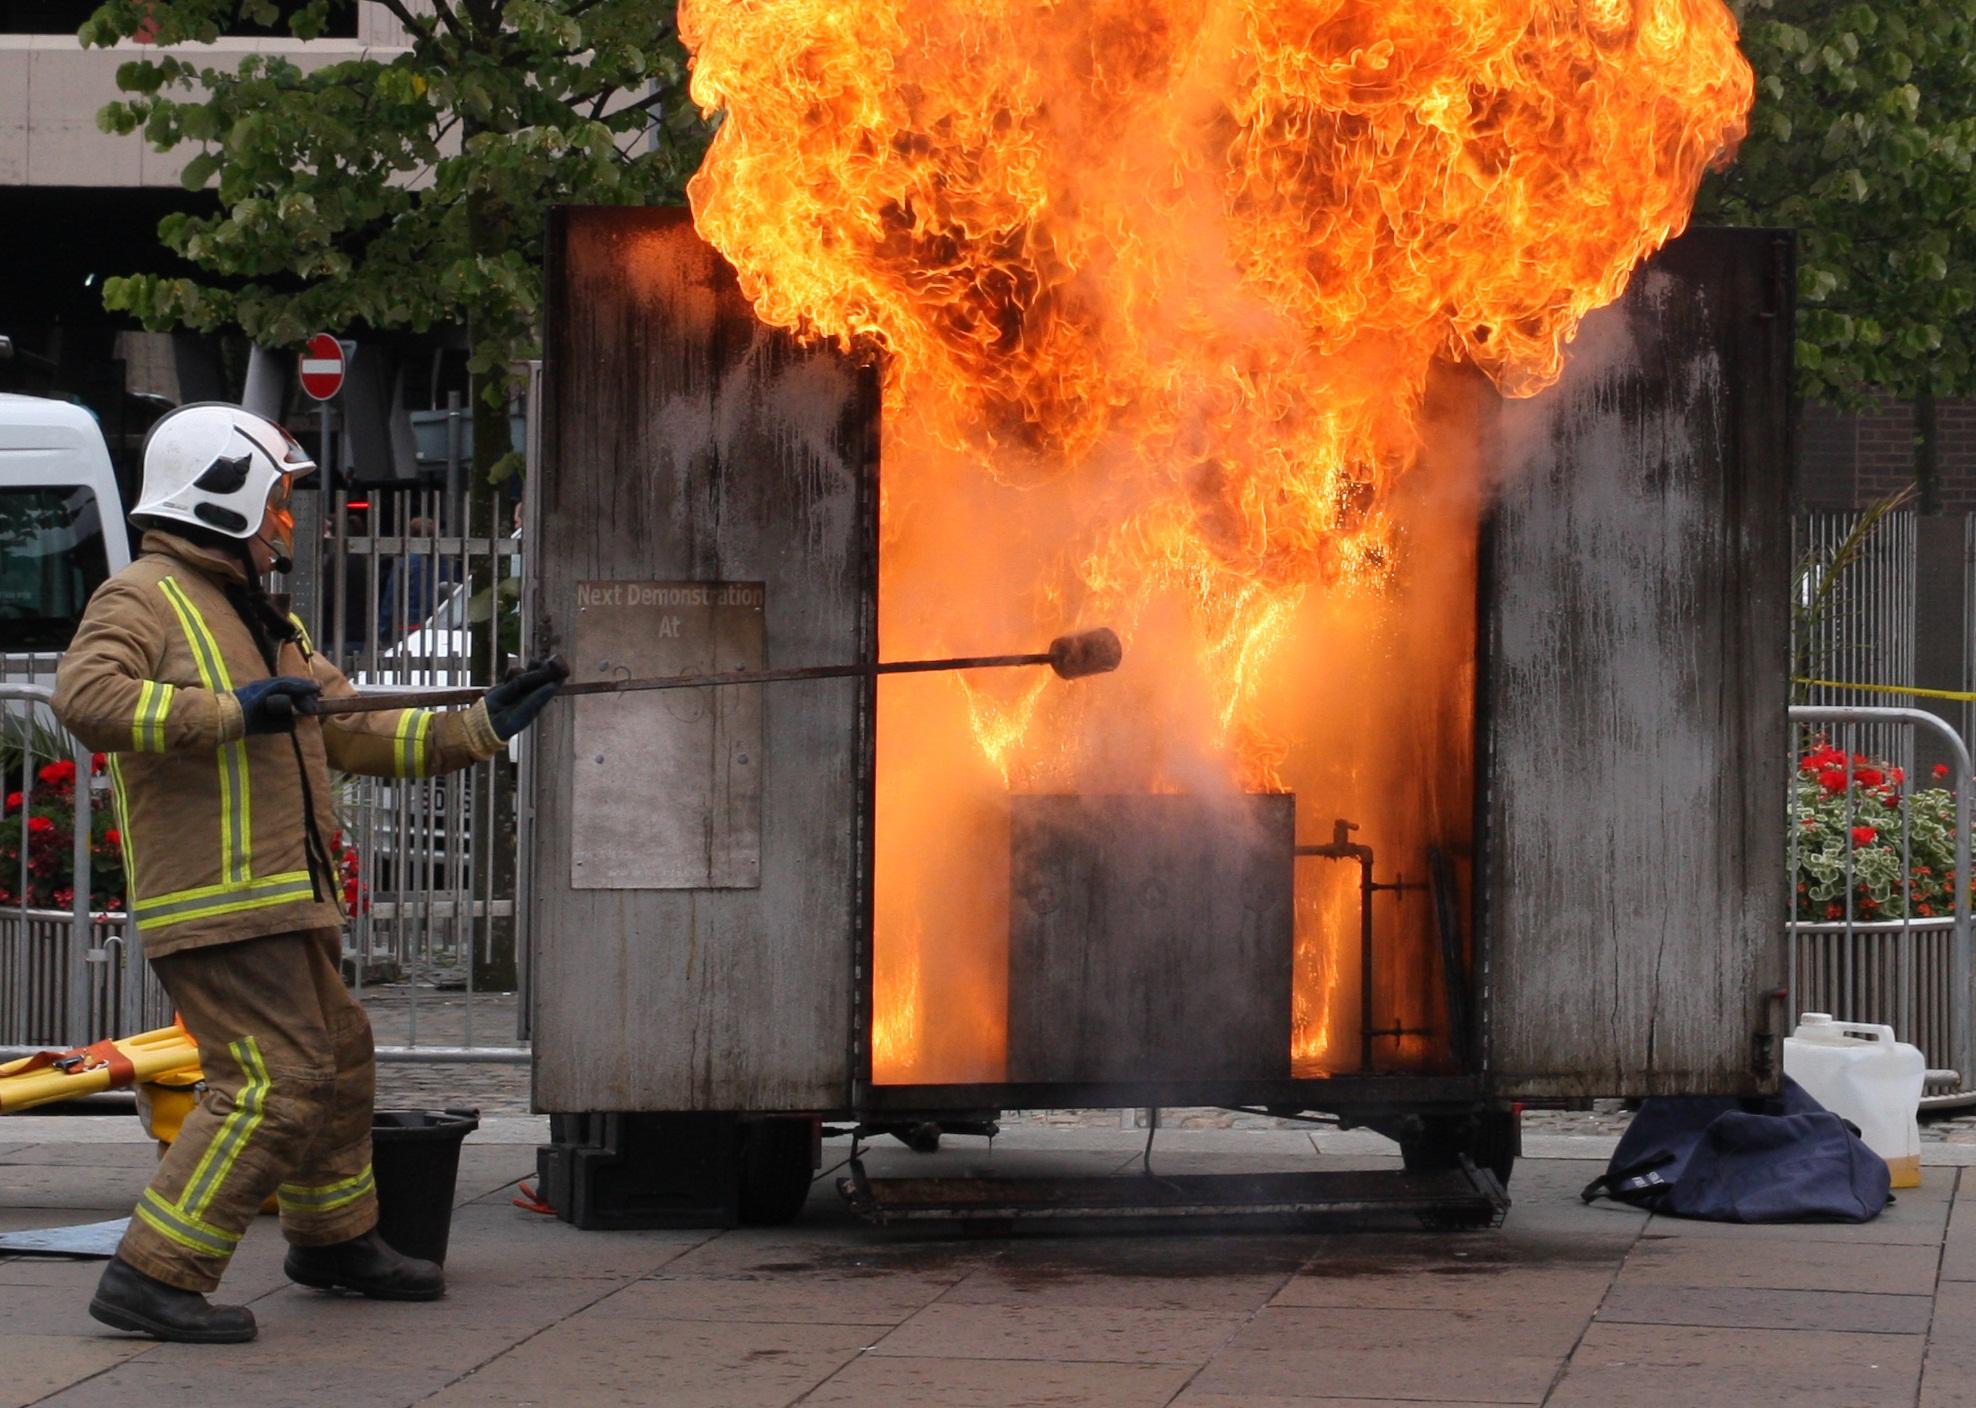 Man suffers smoke inhalation after chip pan fire in Edinburgh flat.